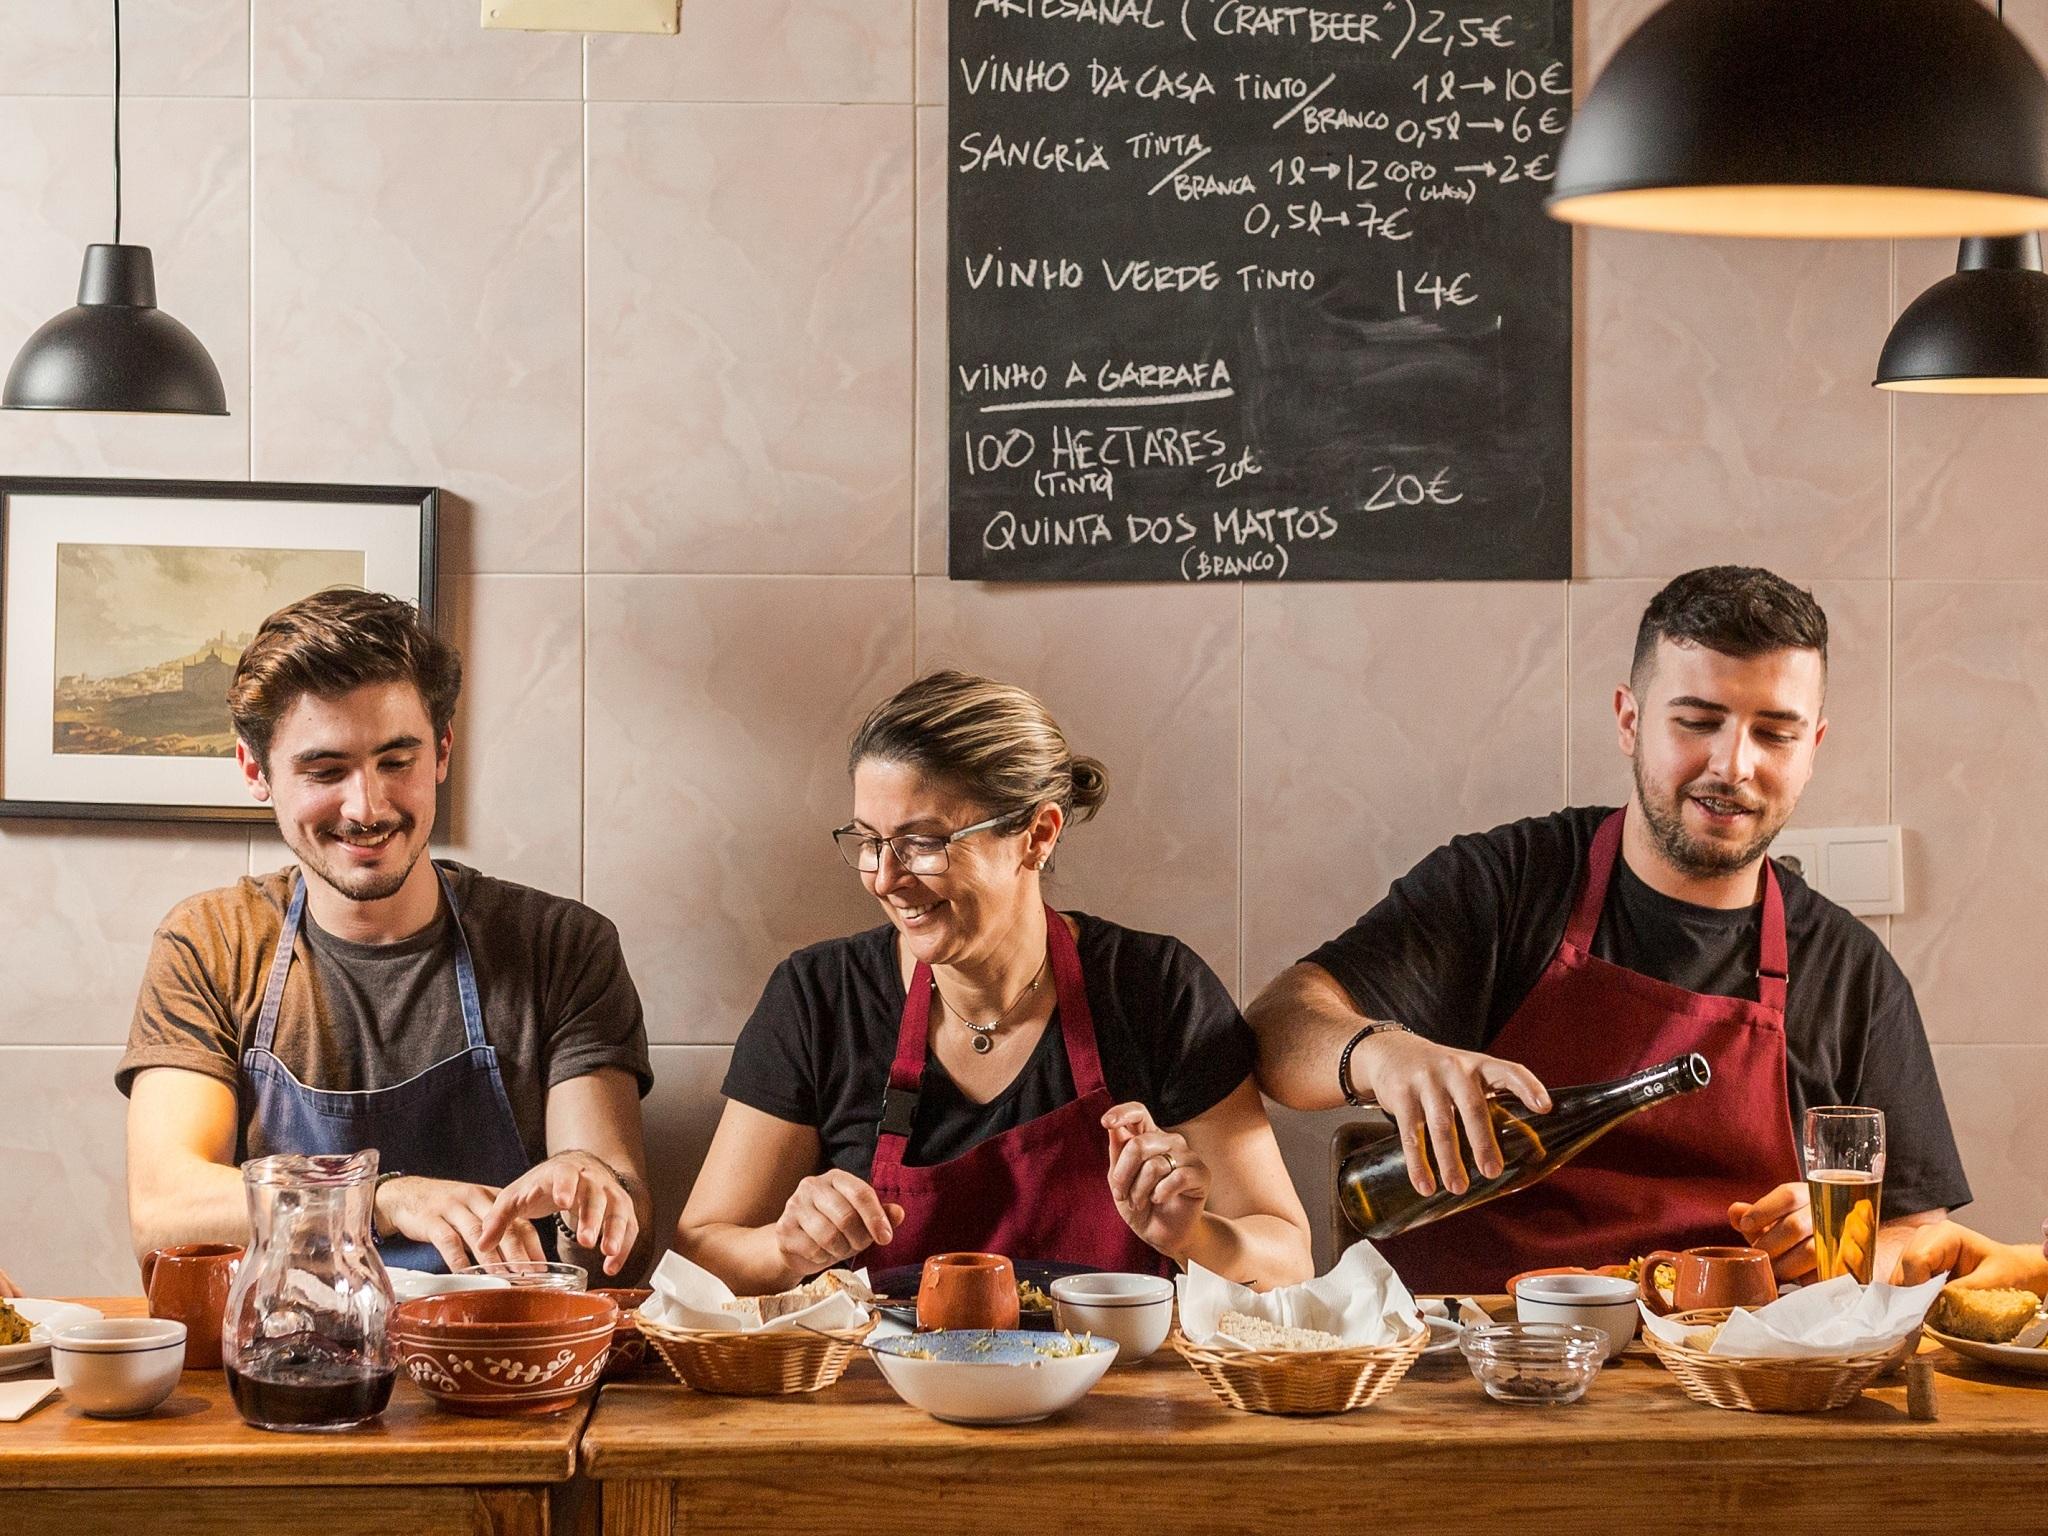 Chef, José Paulo Rocha e Sérgio Algarvio, O Velho Eurico